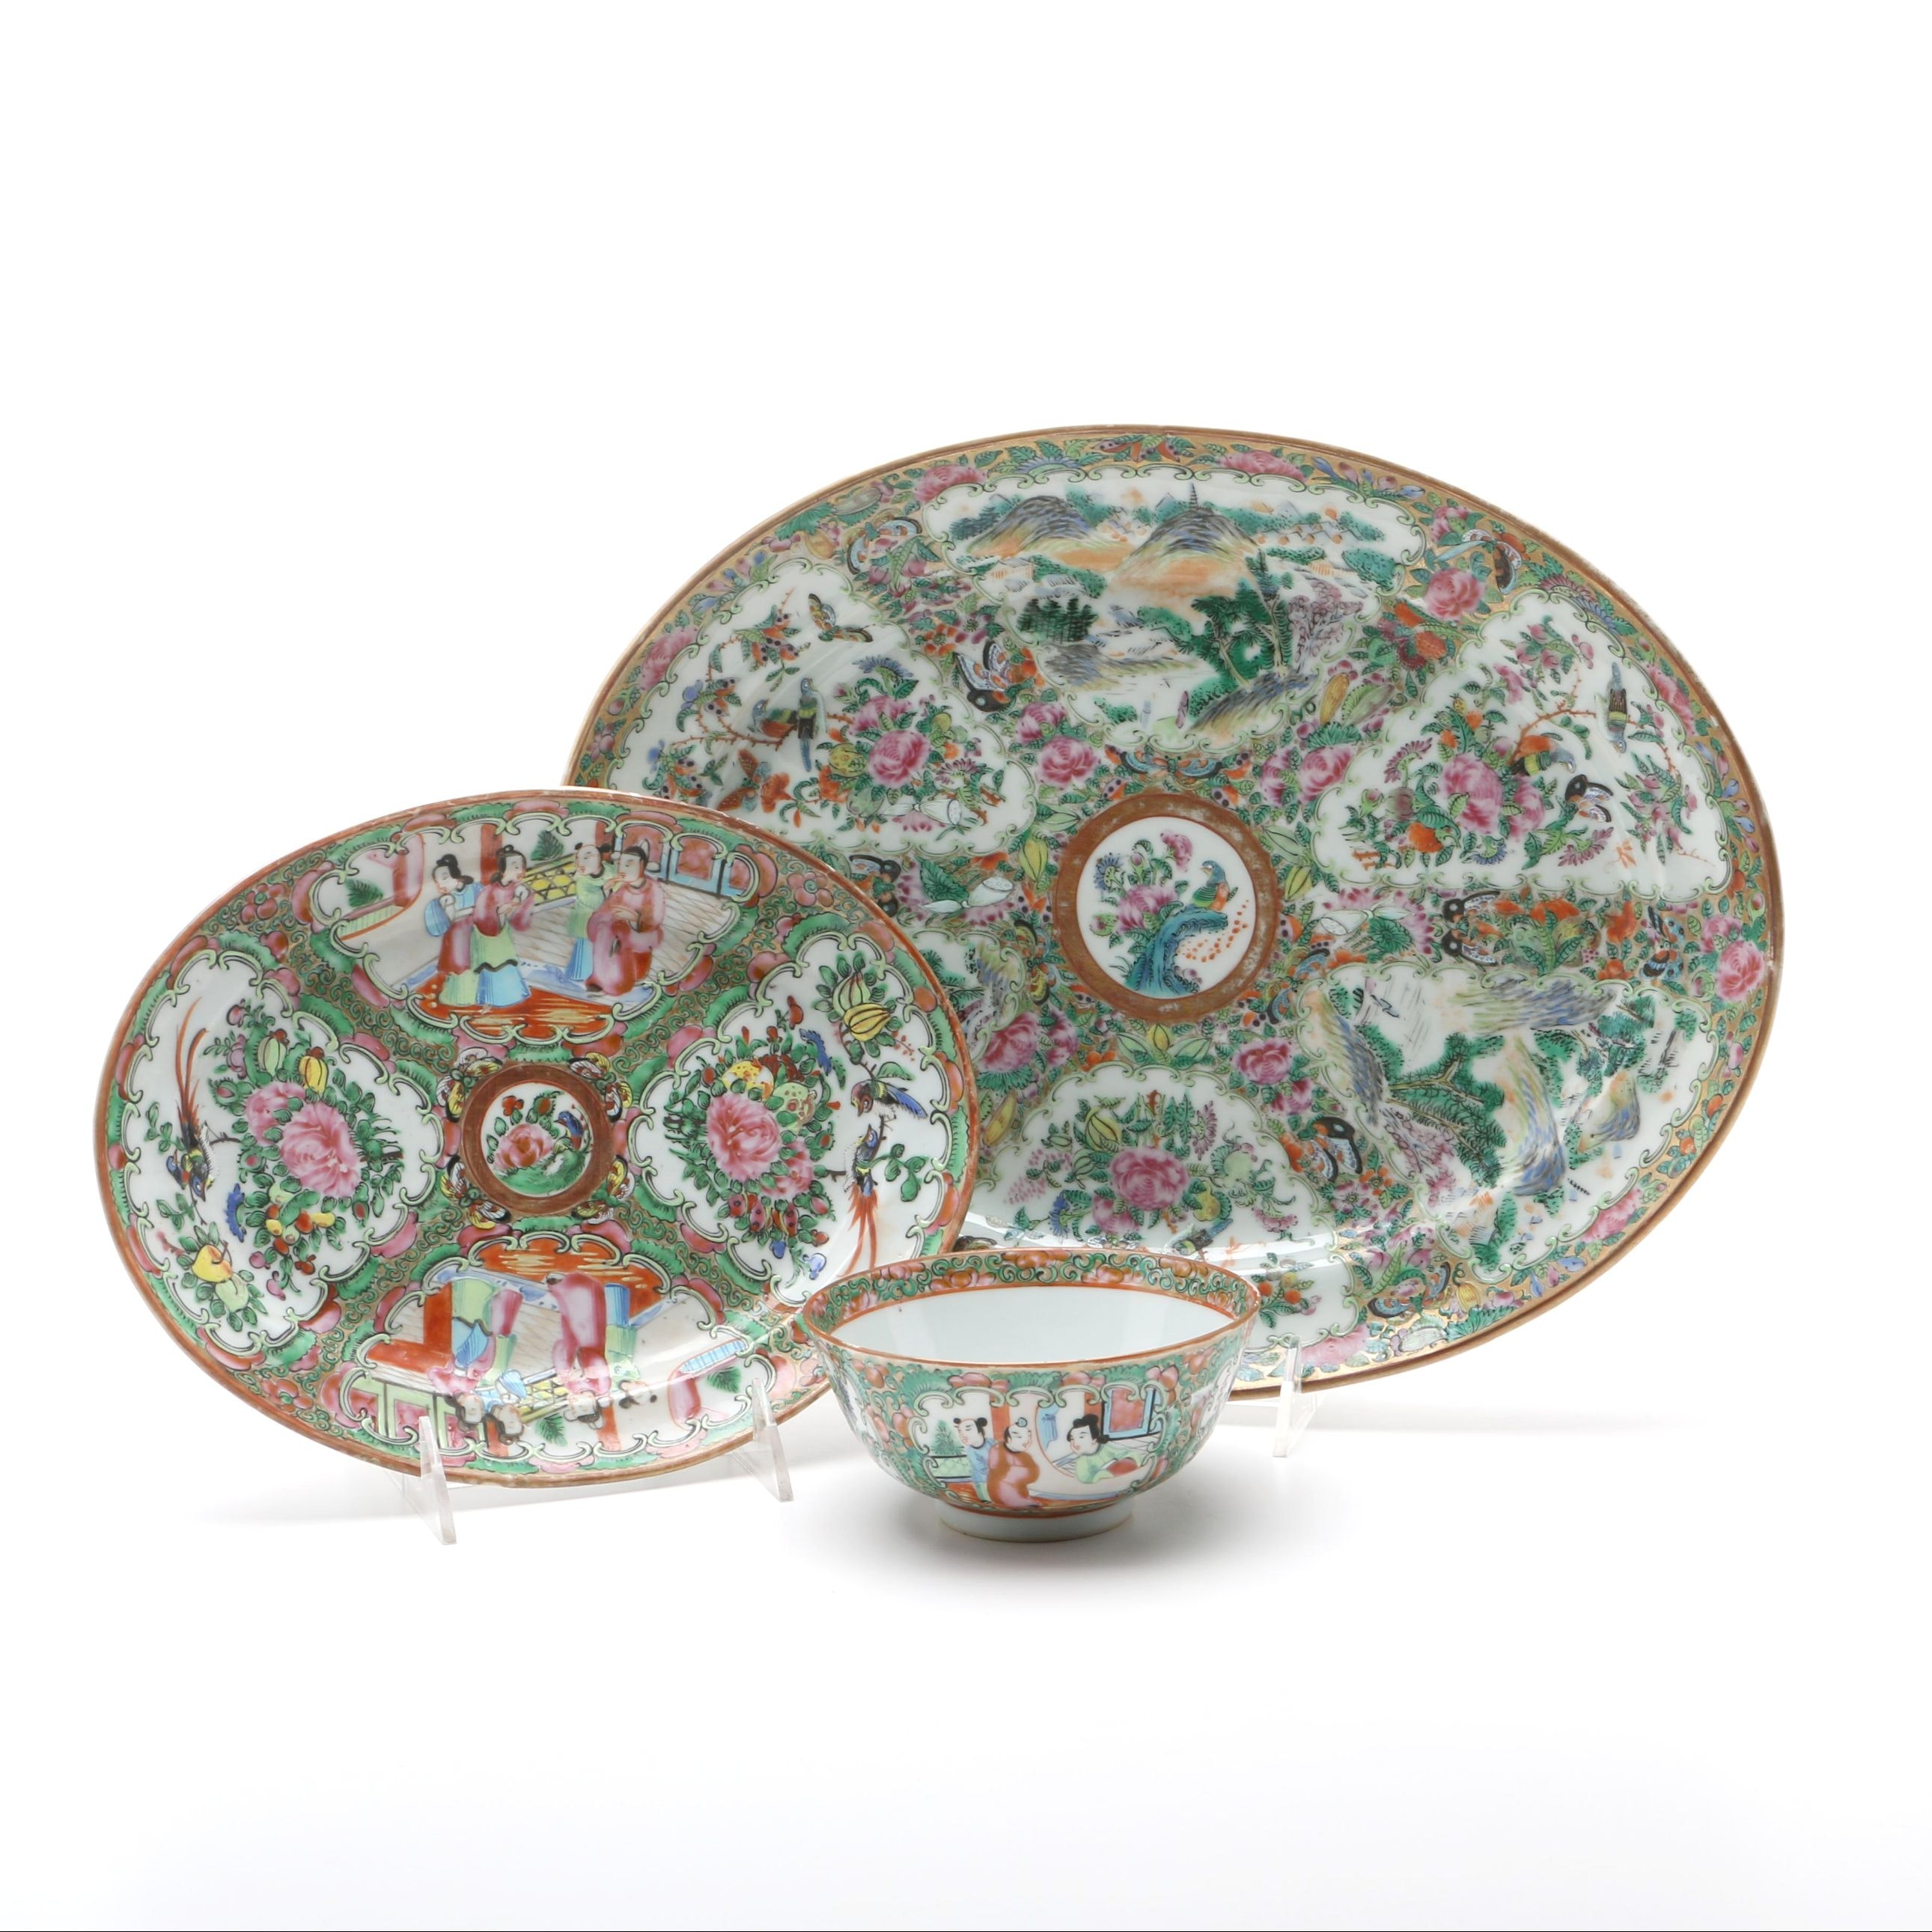 Antique Rose Medallion Platters and Bowl